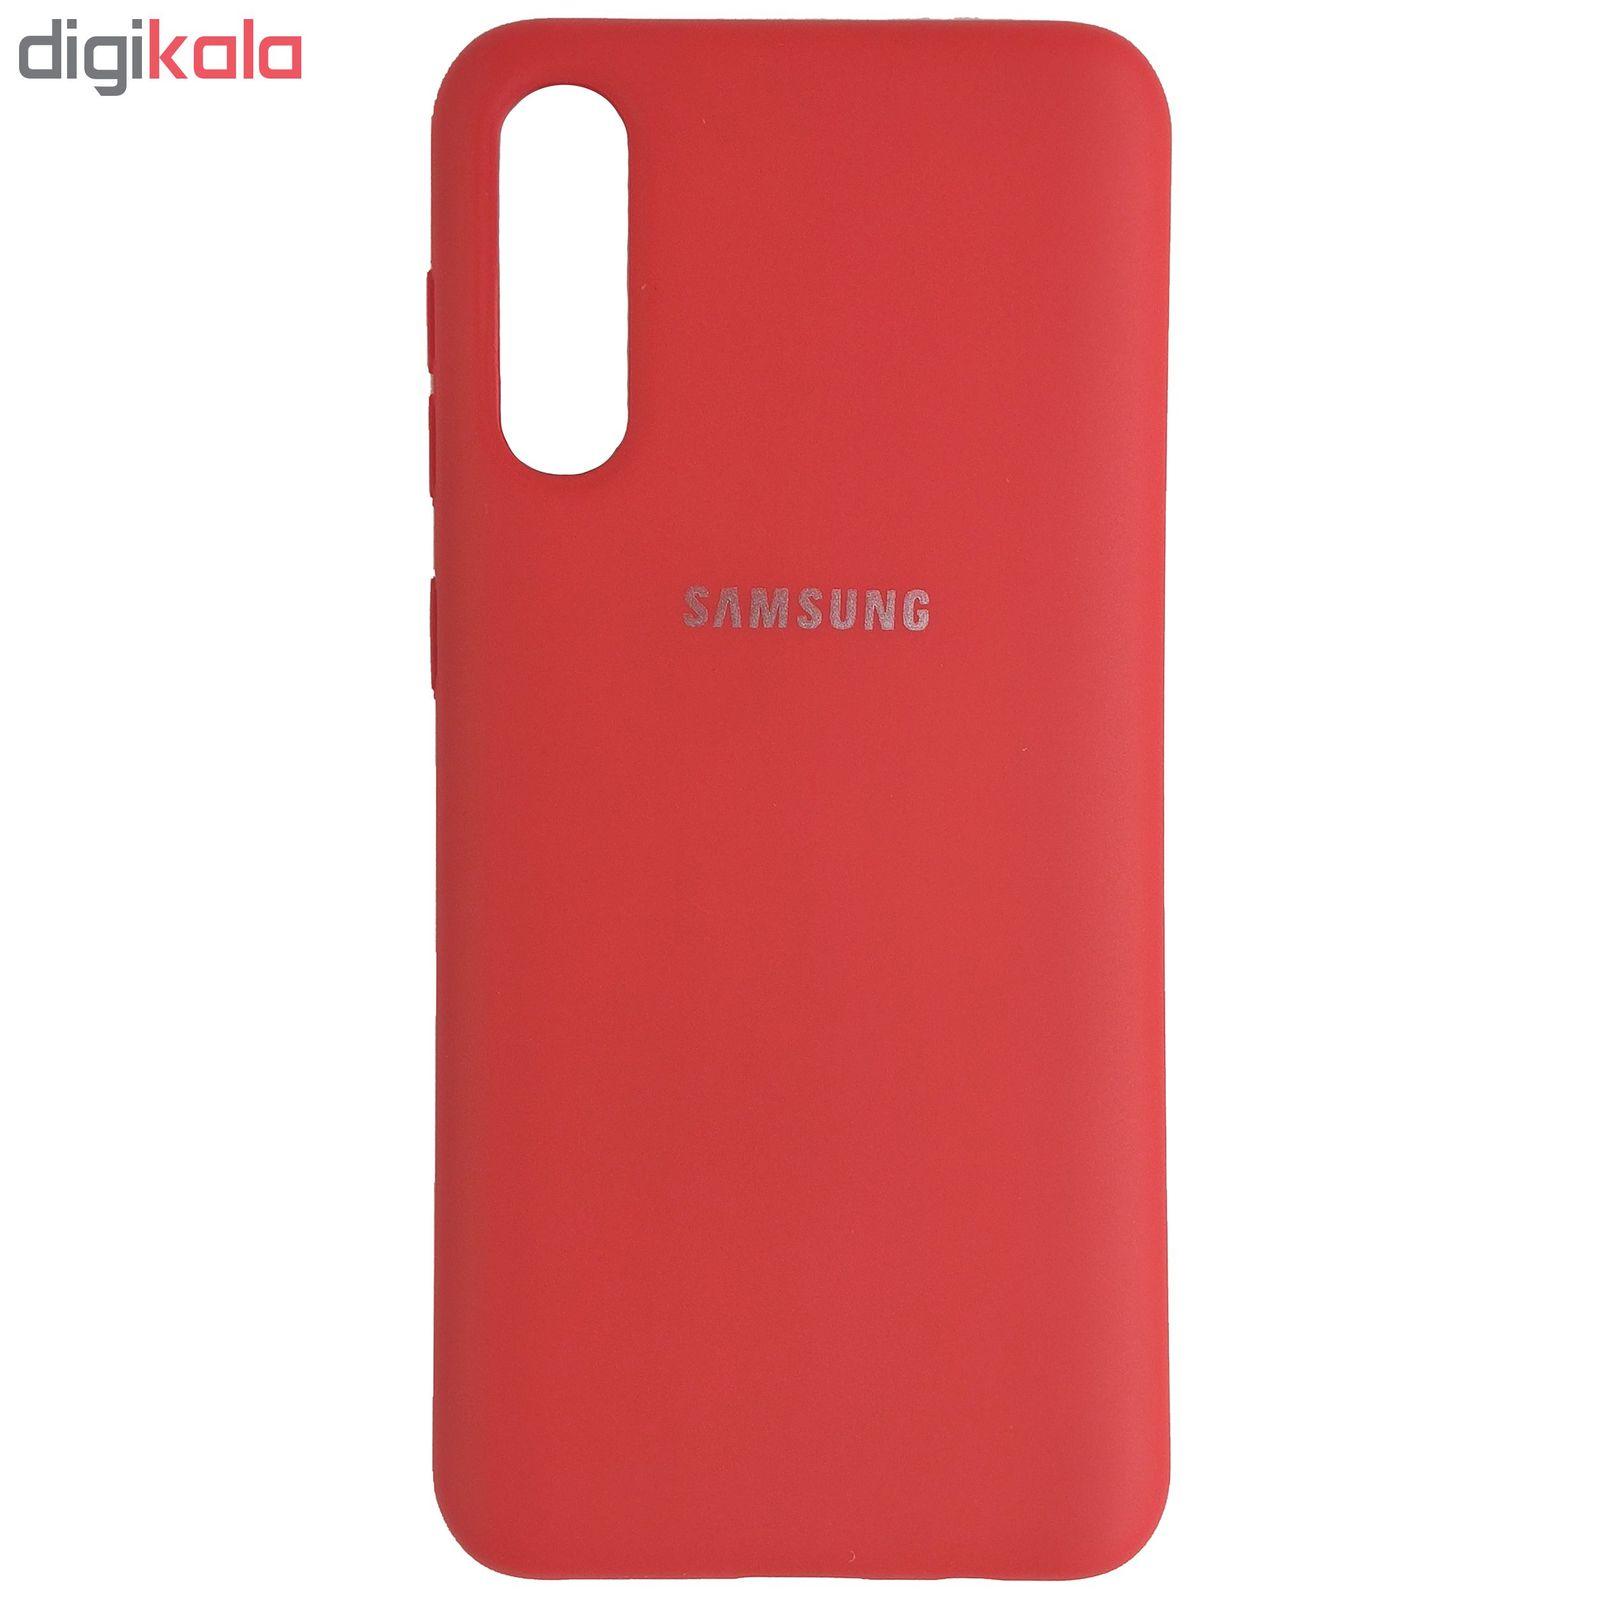 کاور مدل Sliokin مناسب برای گوشی موبایل سامسونگ Galaxy A50/A50s main 1 4